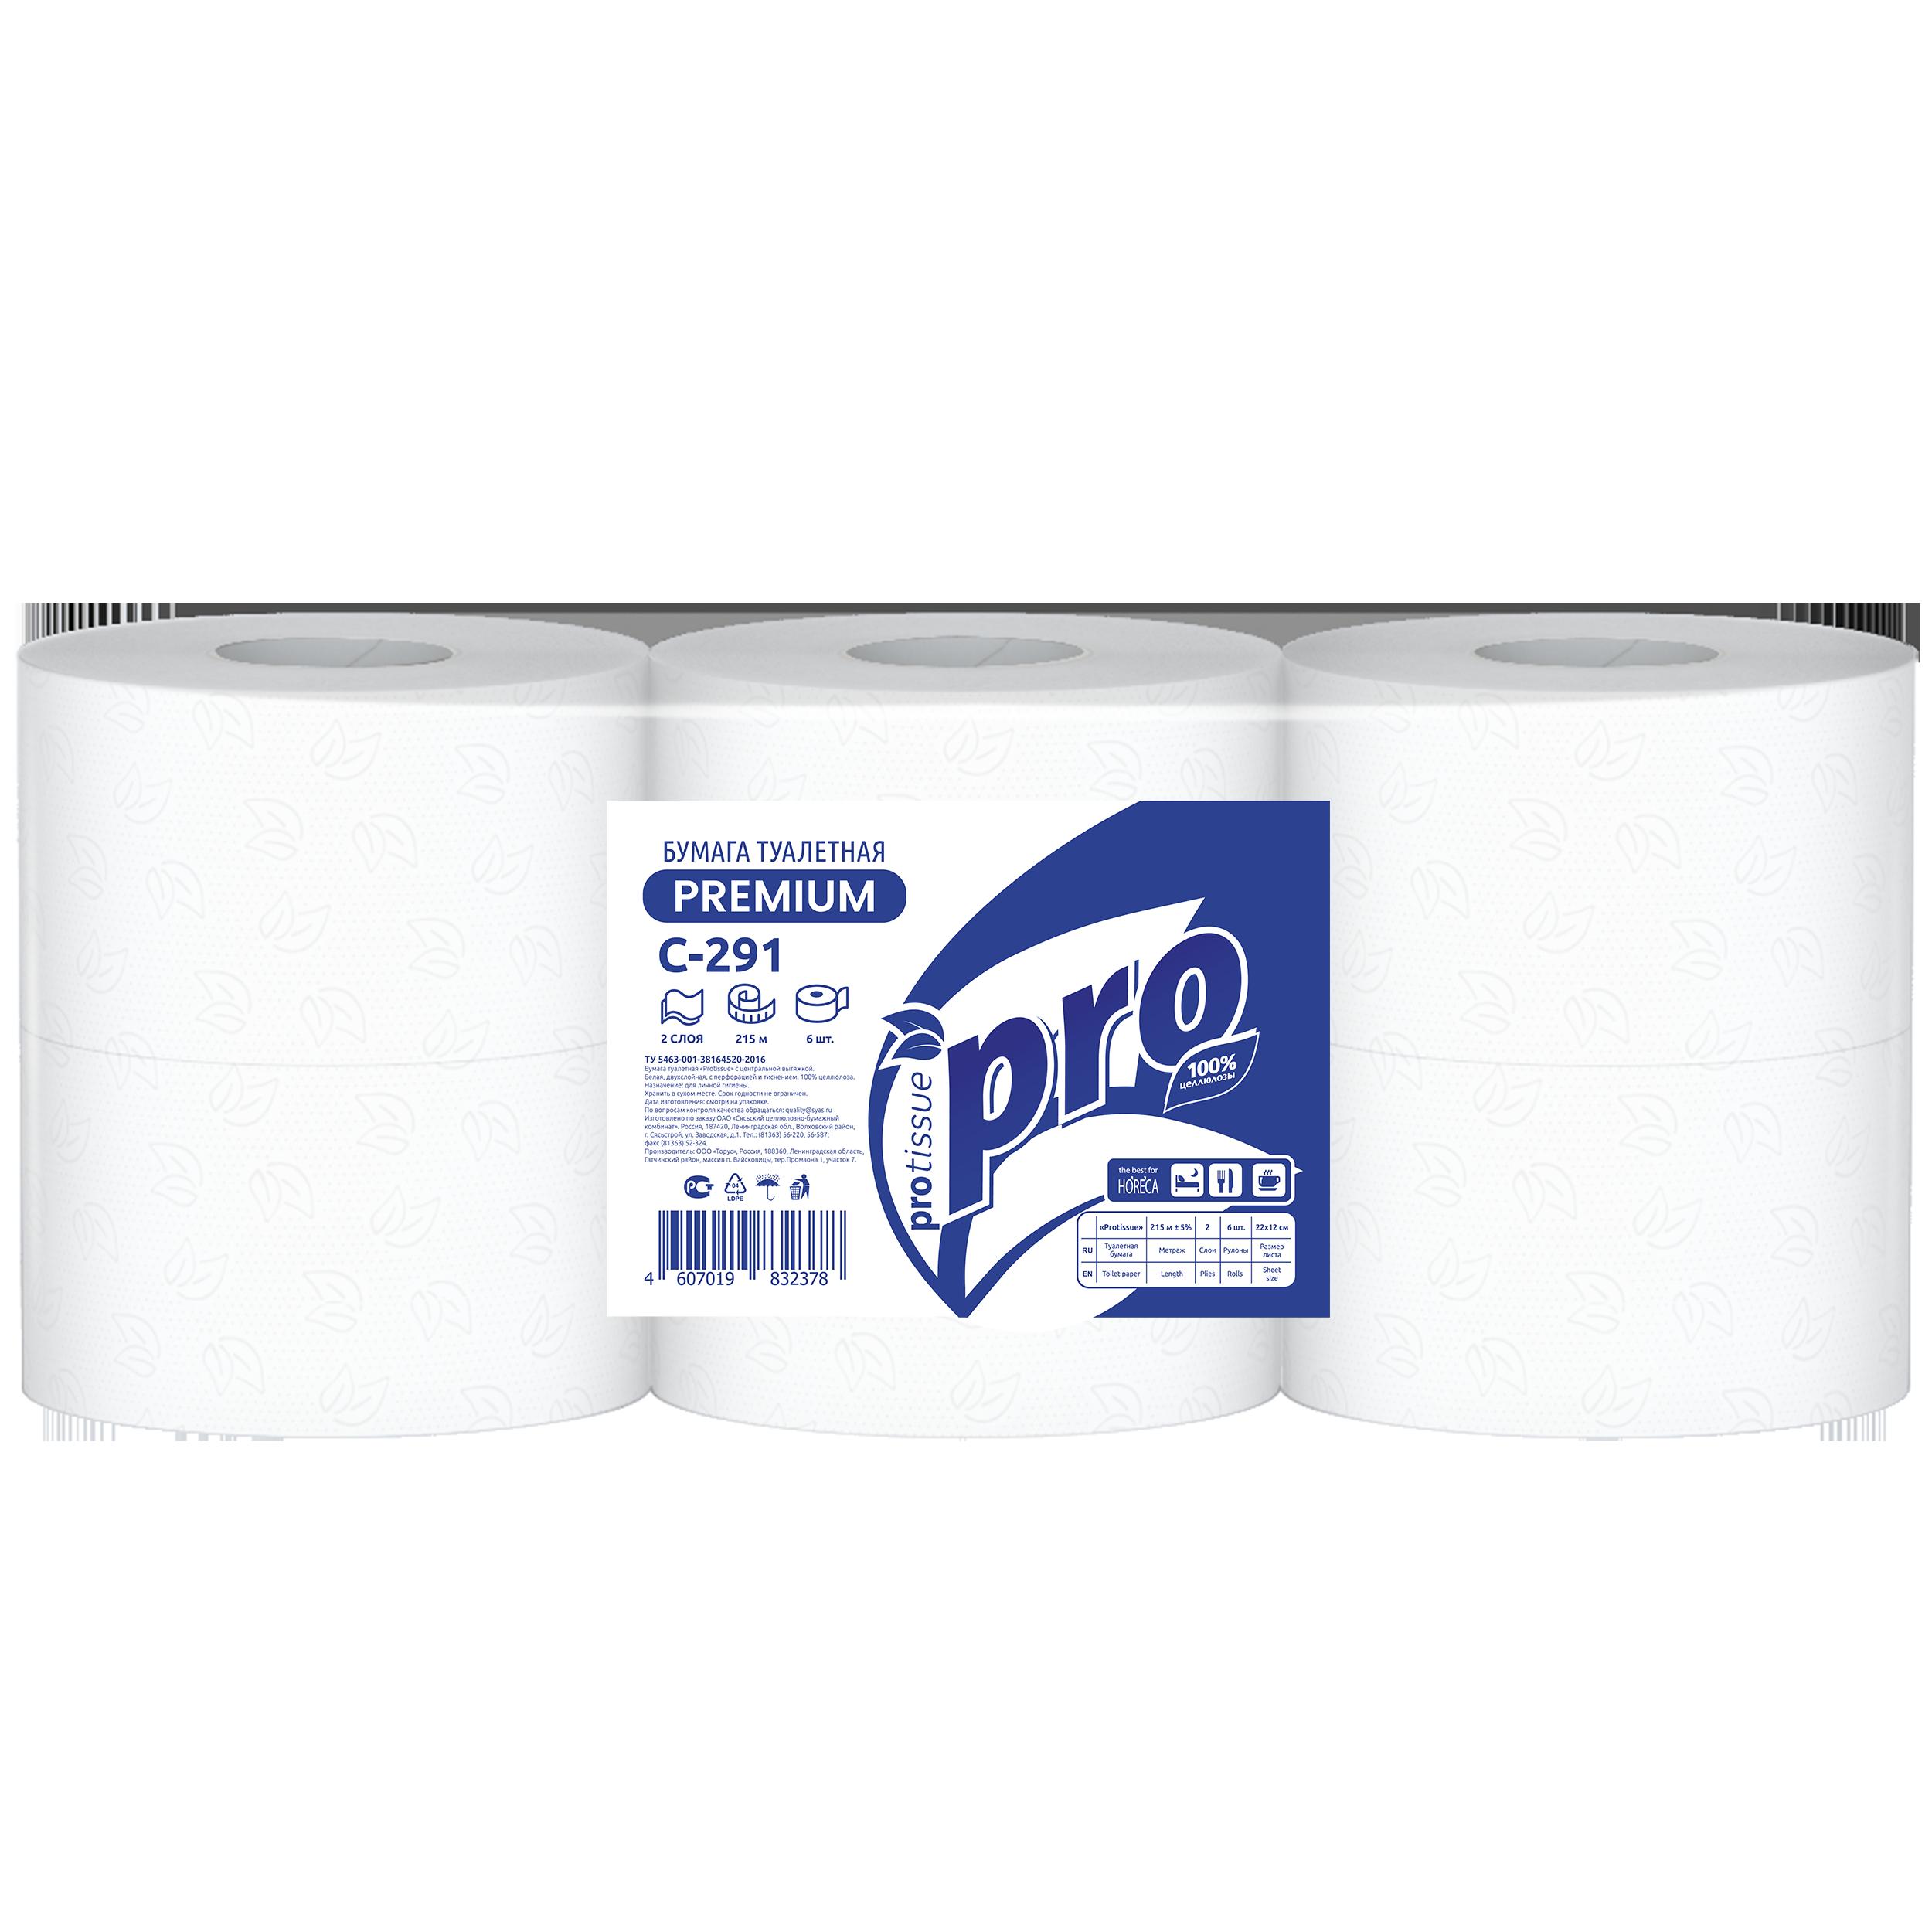 Туалетная бумага с центральной вытяжкой